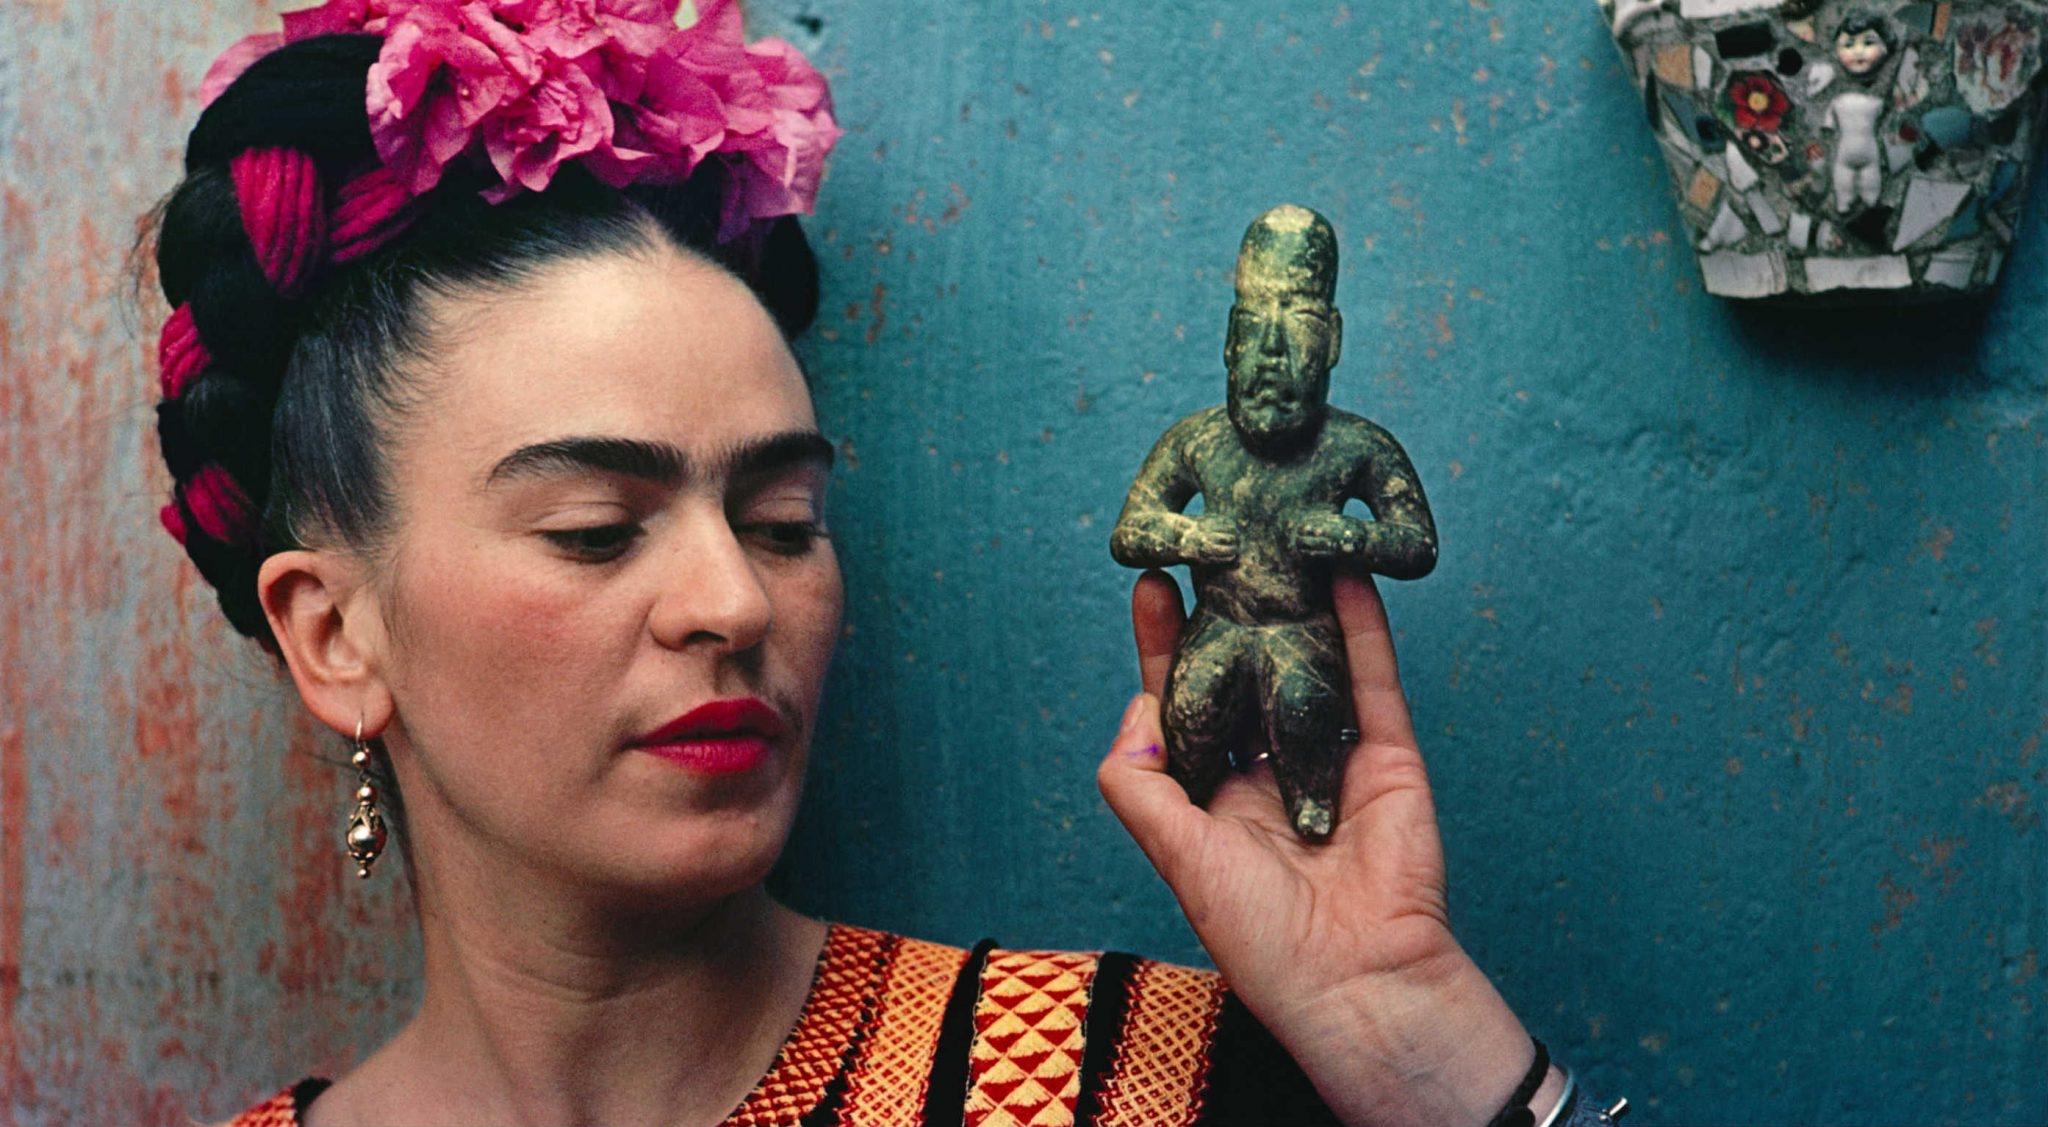 Frida Kahlo, Mudec, MudecMi, Milano MudecMilano, Frida, Messico, Mexico, Nickolas Muray, Diego Sileo